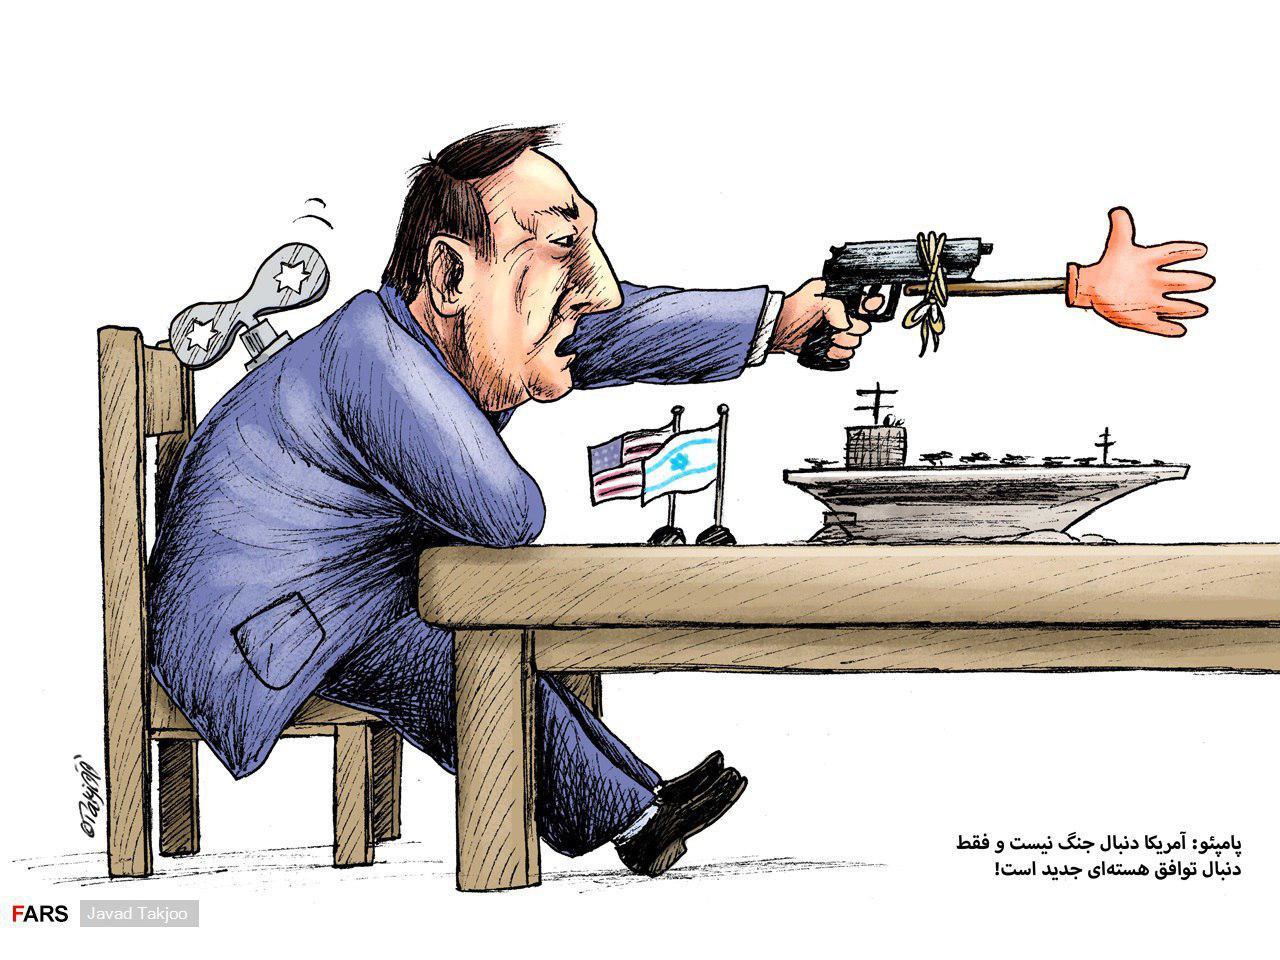 عکس خبري -کاريکاتور: مذاکره با چاشني تهديد و تحريم!